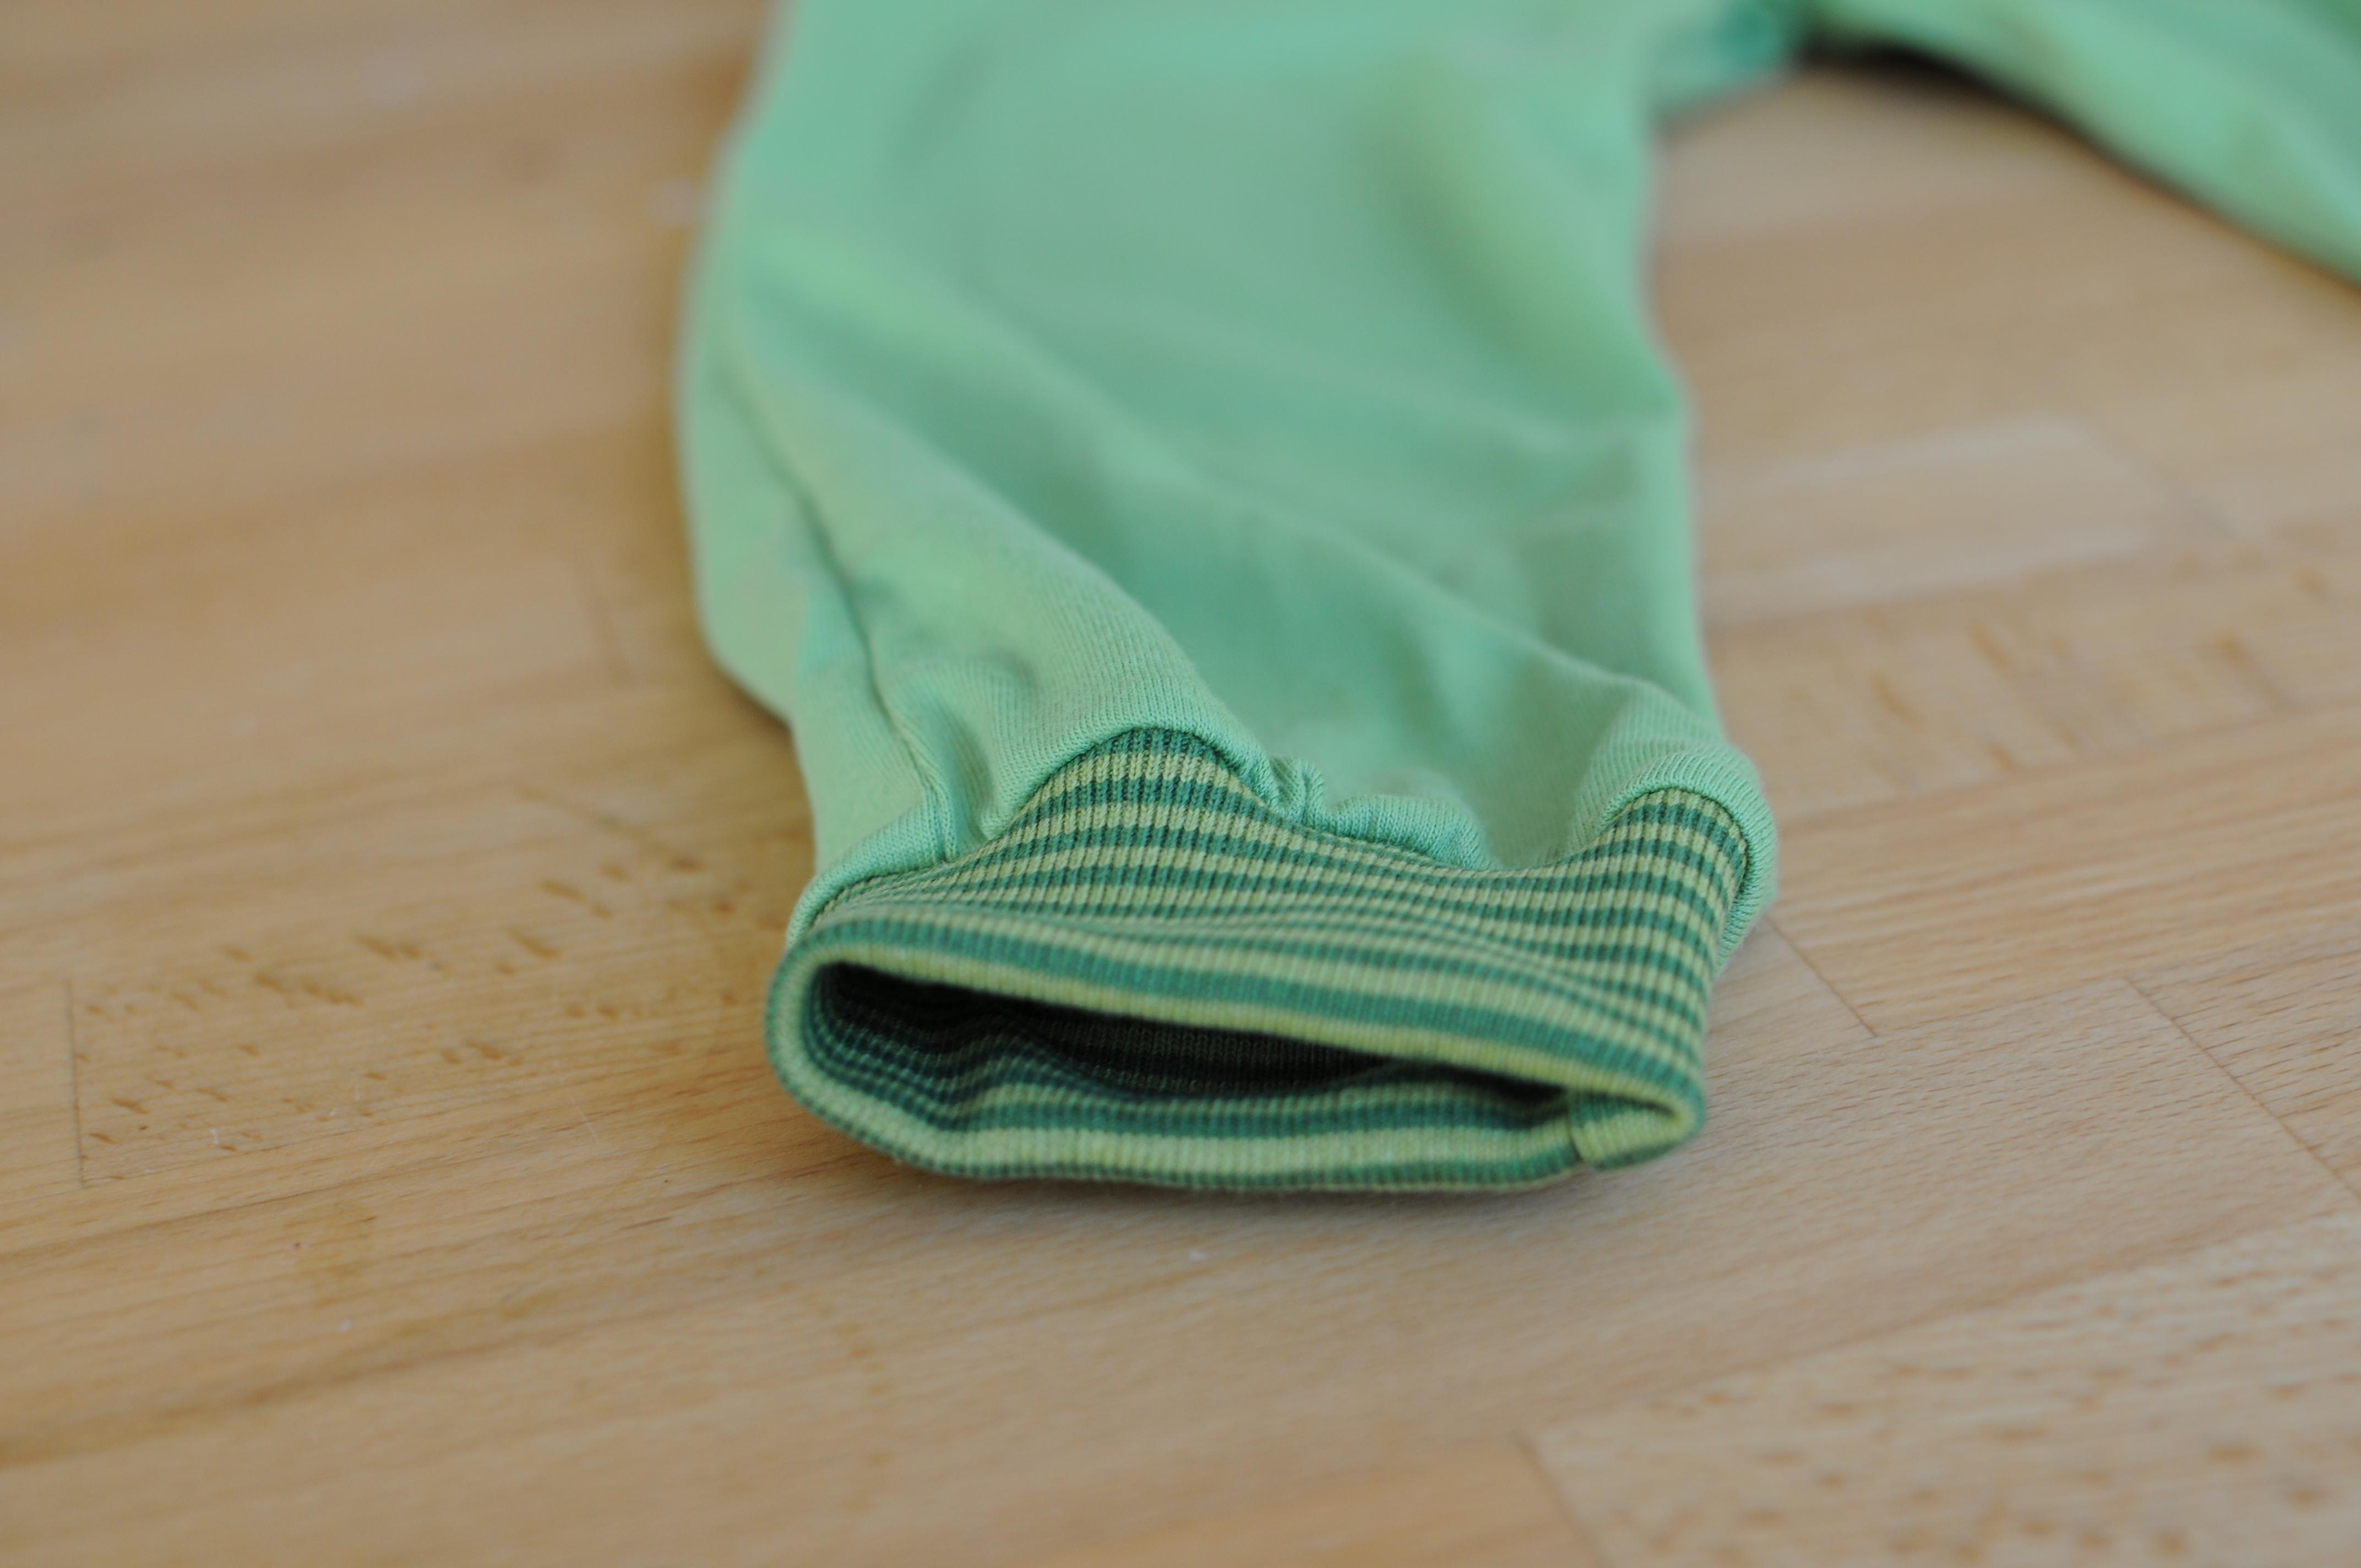 Kuhschlafanzug_Hose_Detail